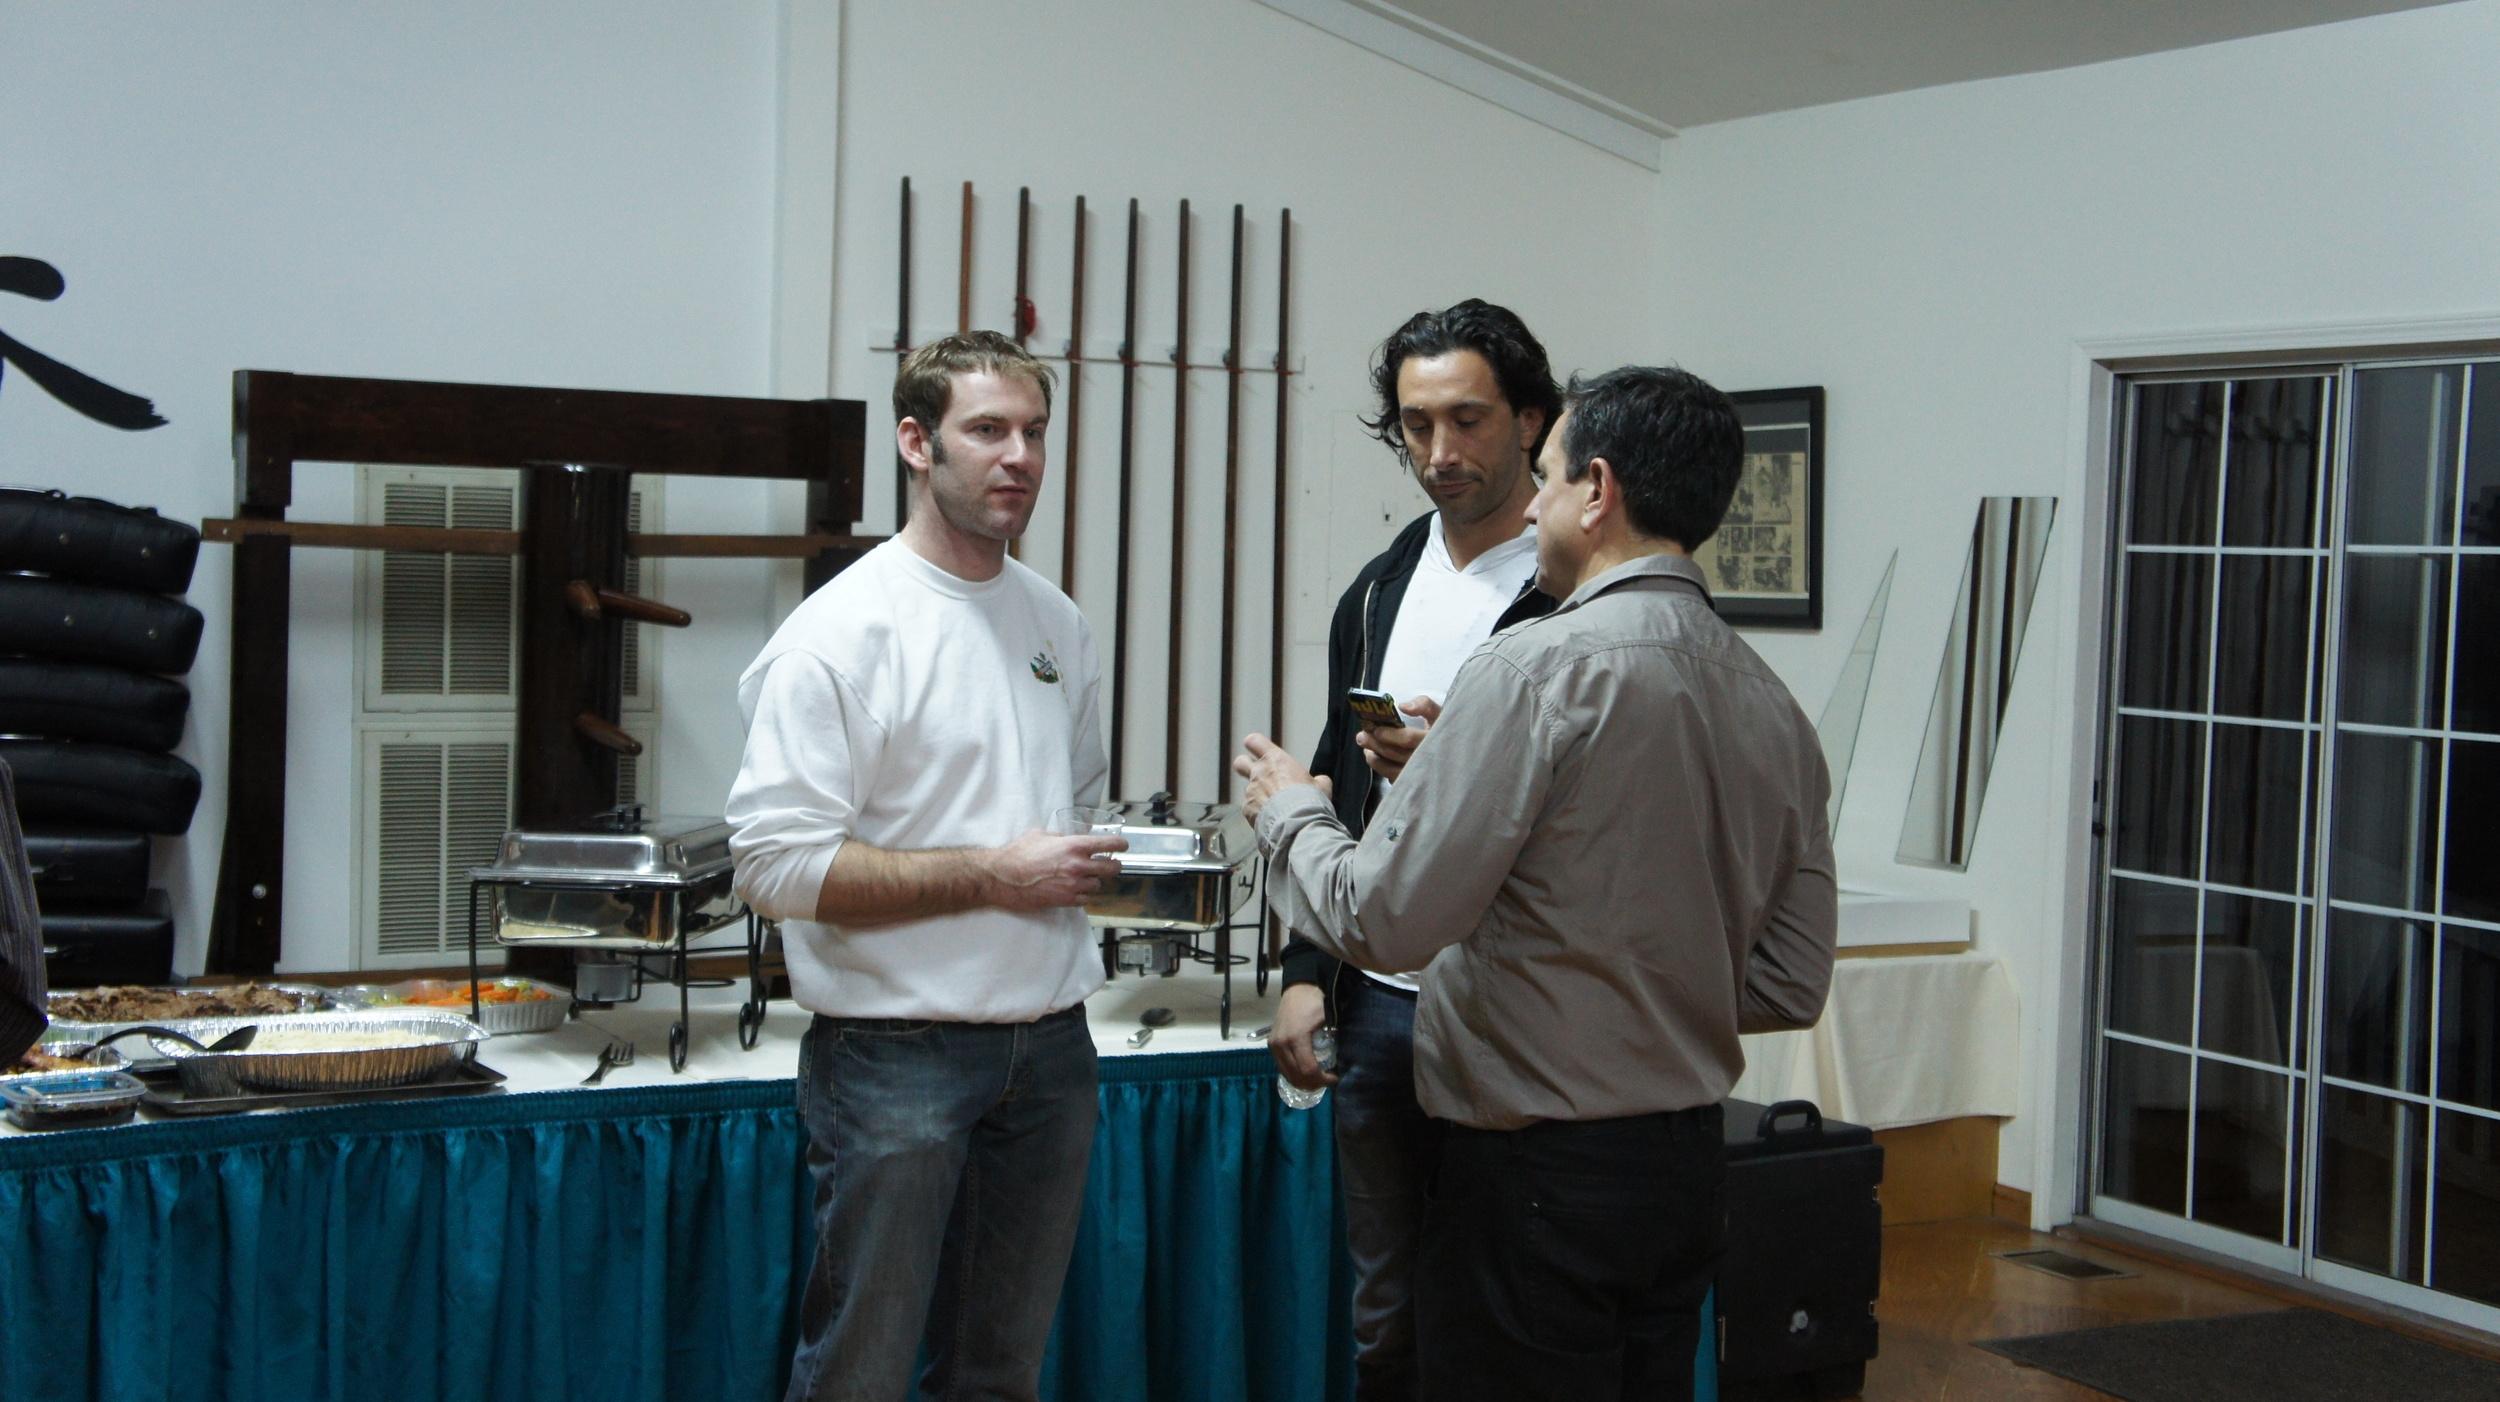 Sihings Zeljko, Andrea, and Gordon